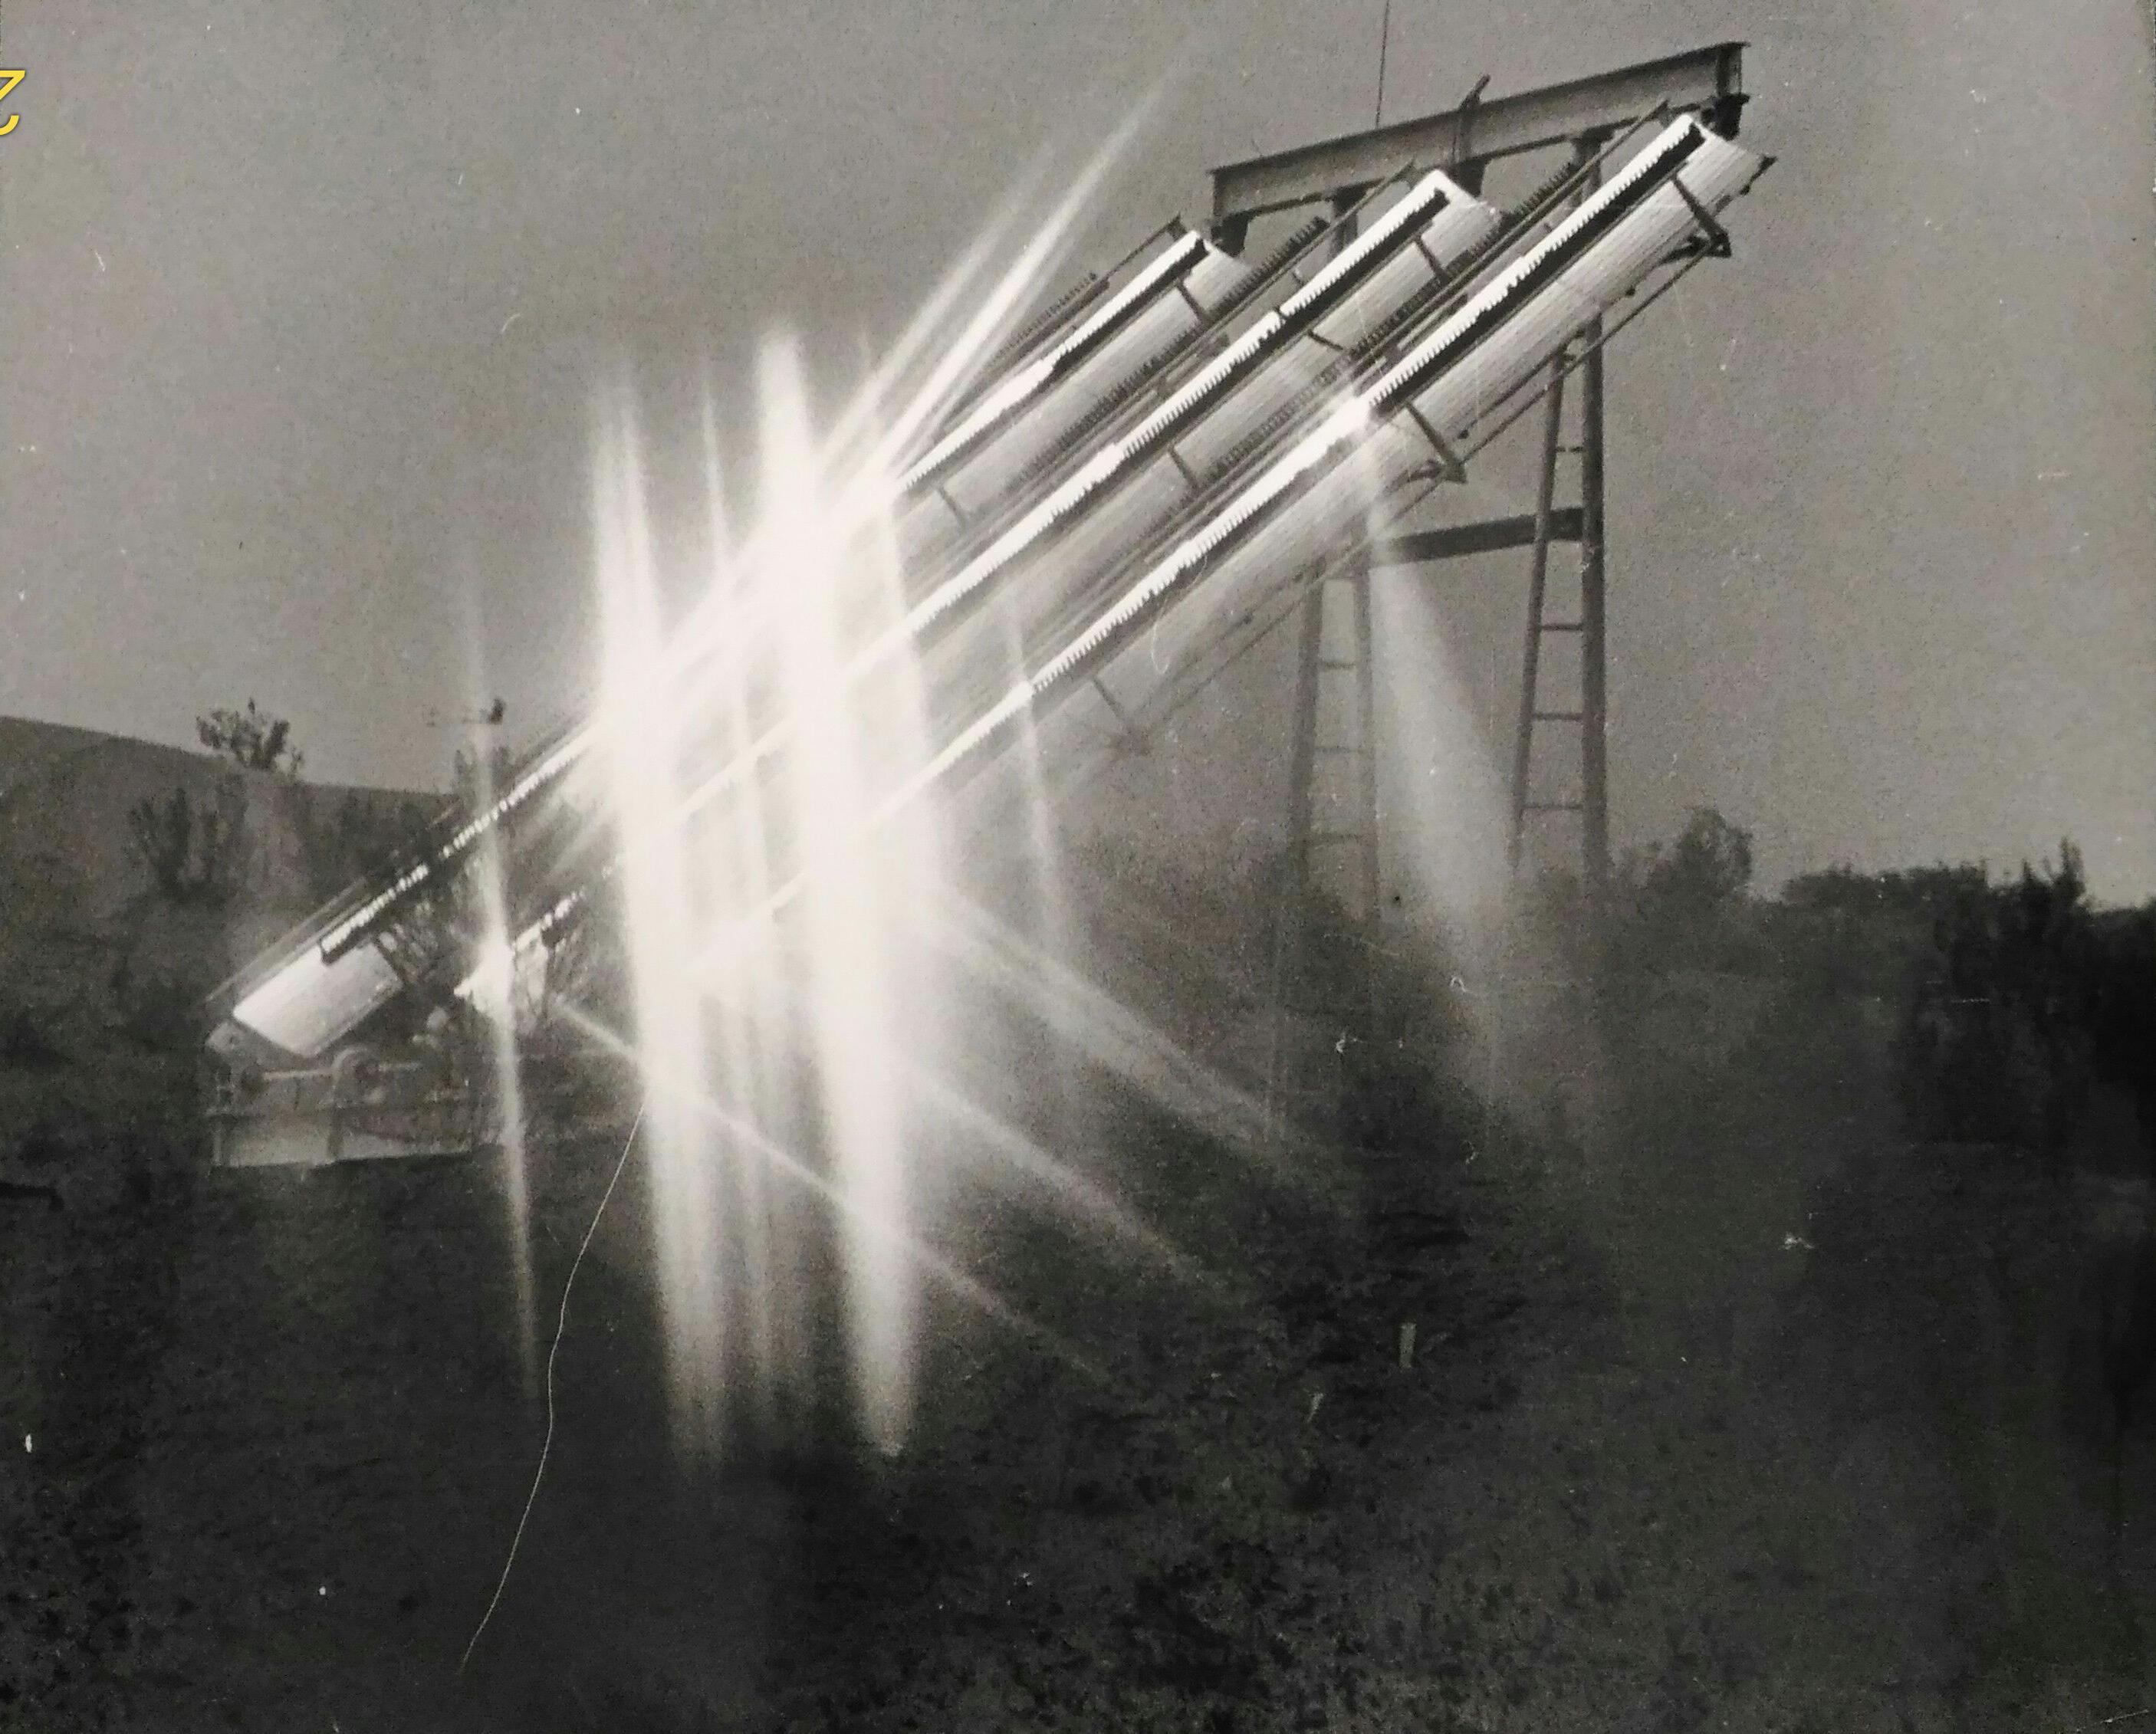 1970-е.  Зельма Г.А. «Энергия света»